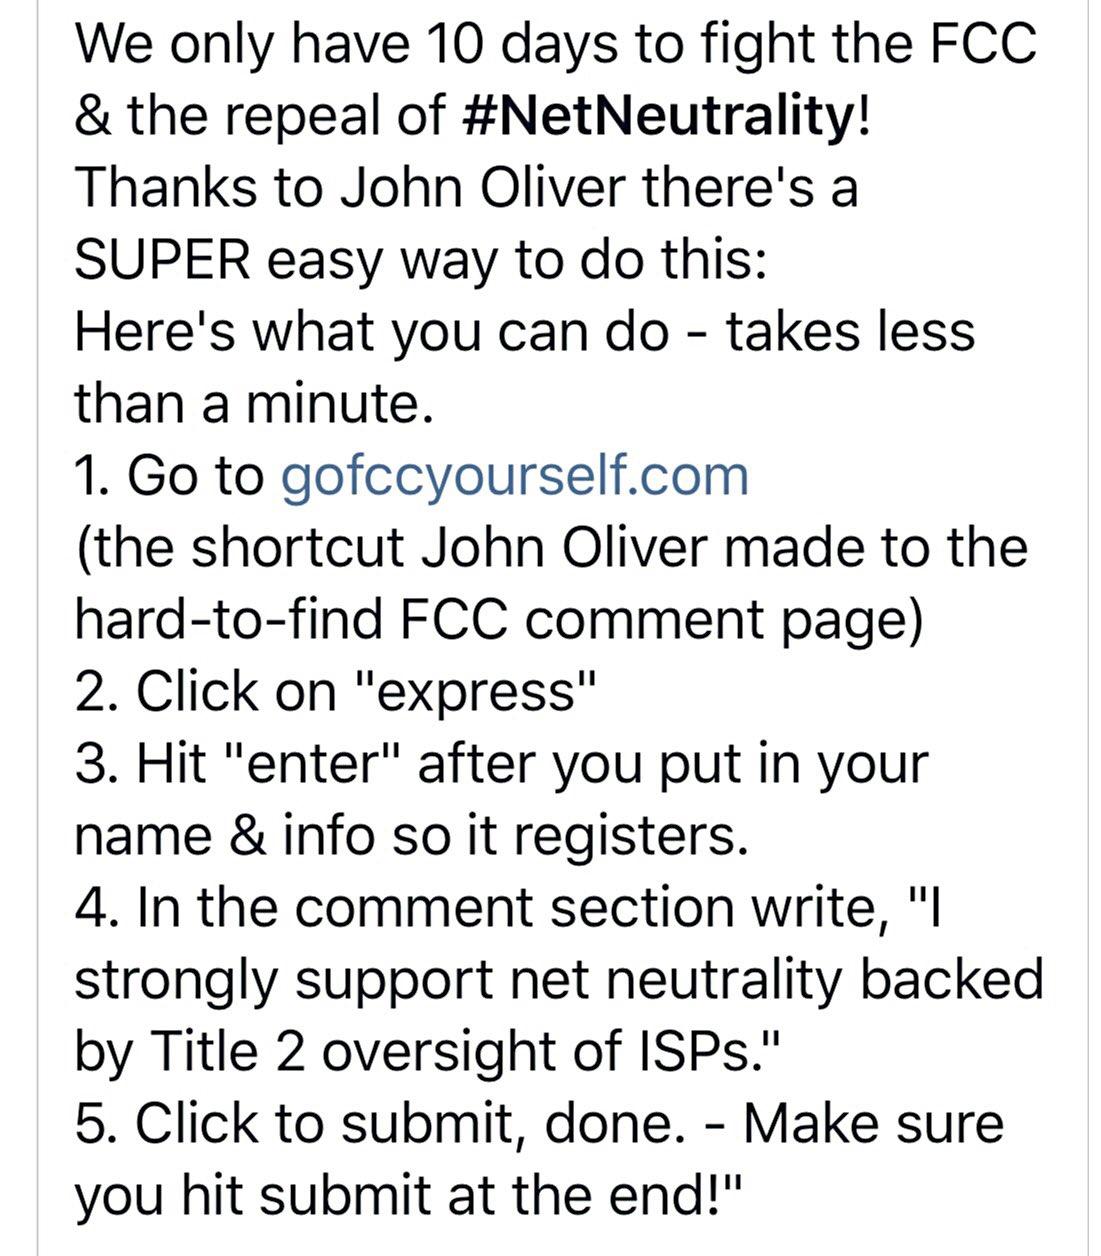 DO THIS! It's so easy! https://t.co/eZyJVa672b #NetNeutrality #FCC #HandsOffMyInternet https://t.co/gW0osecfgR